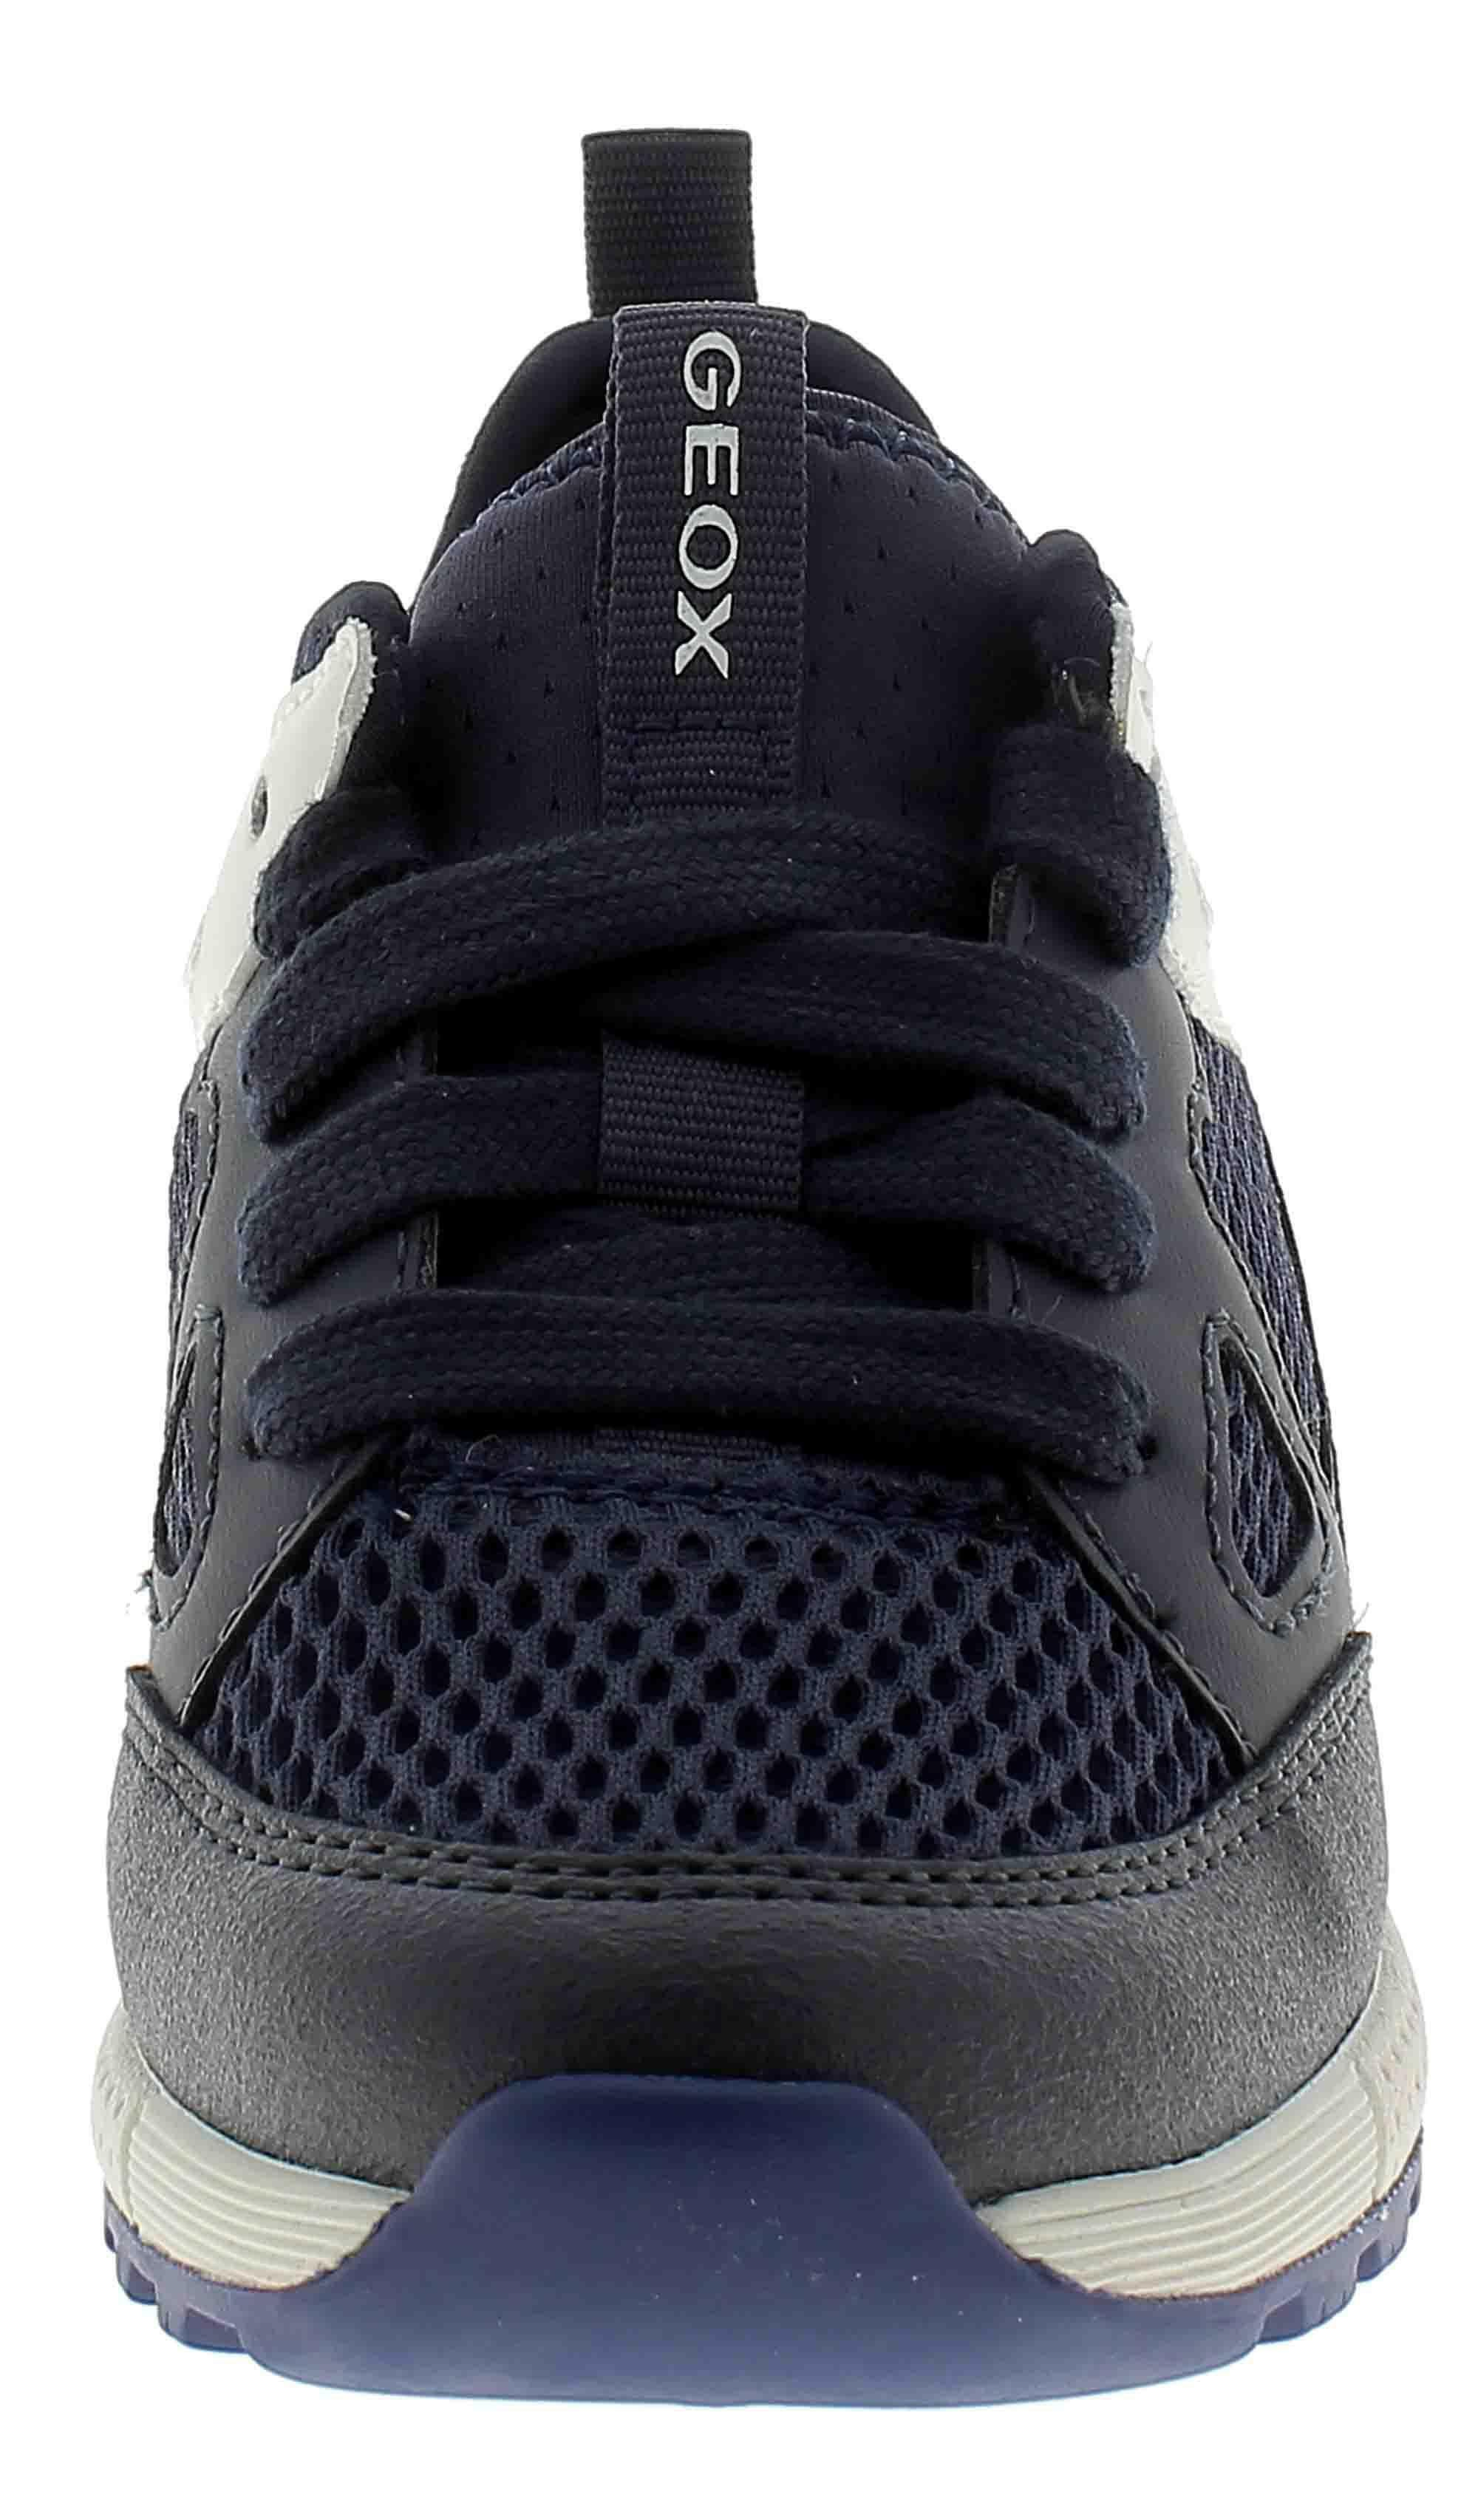 Geox j alben scarpe sportive bambino blu j9292edc0735